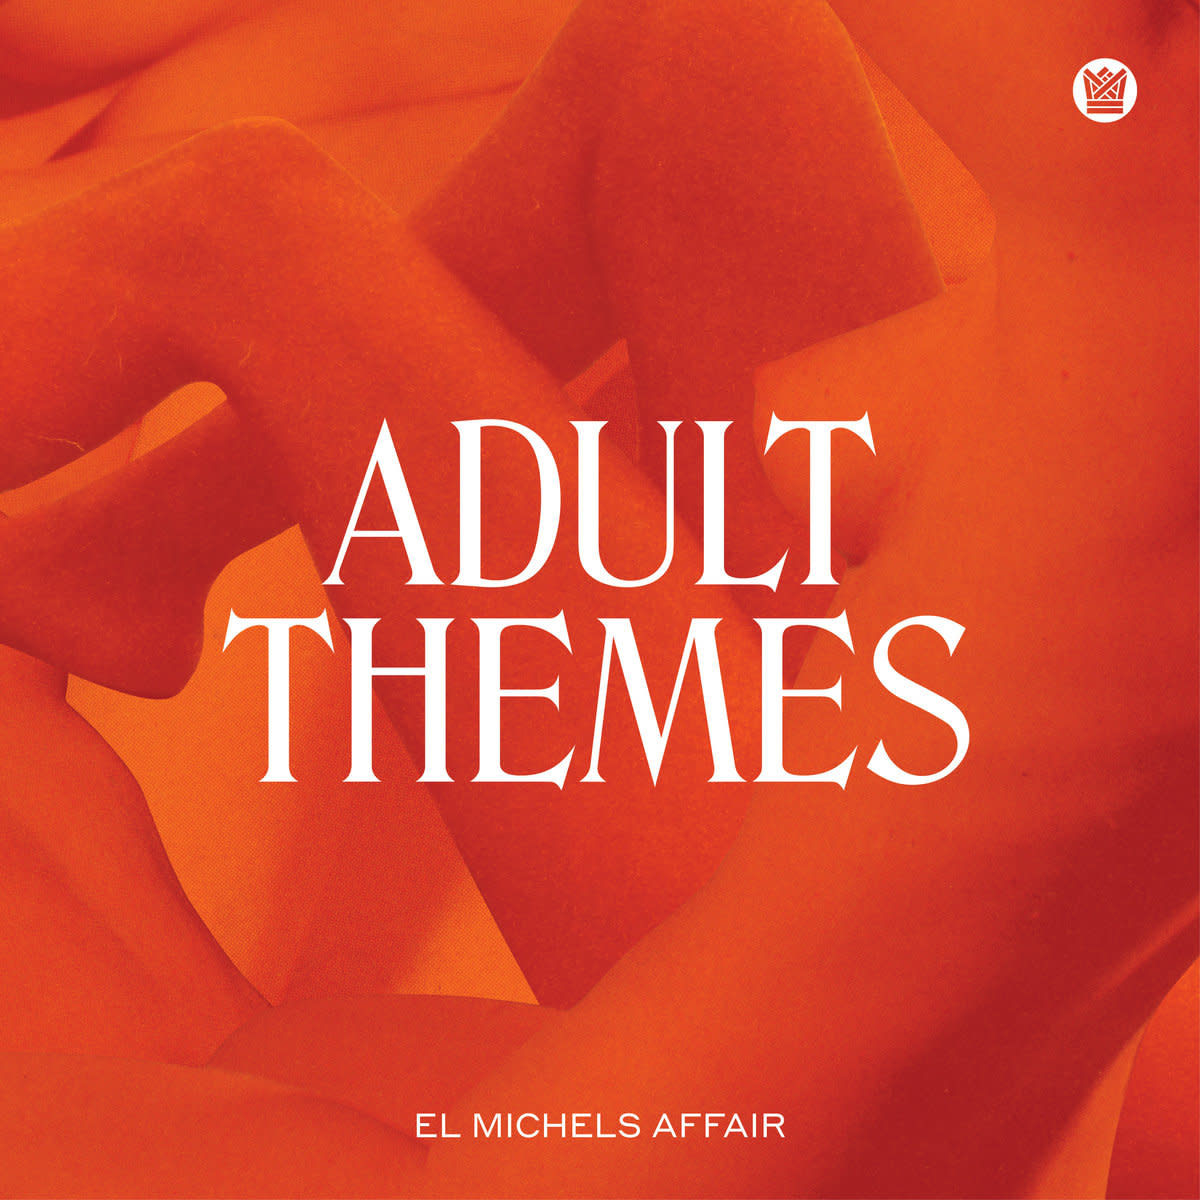 Big Crown El Michels Affair - Adult Themes